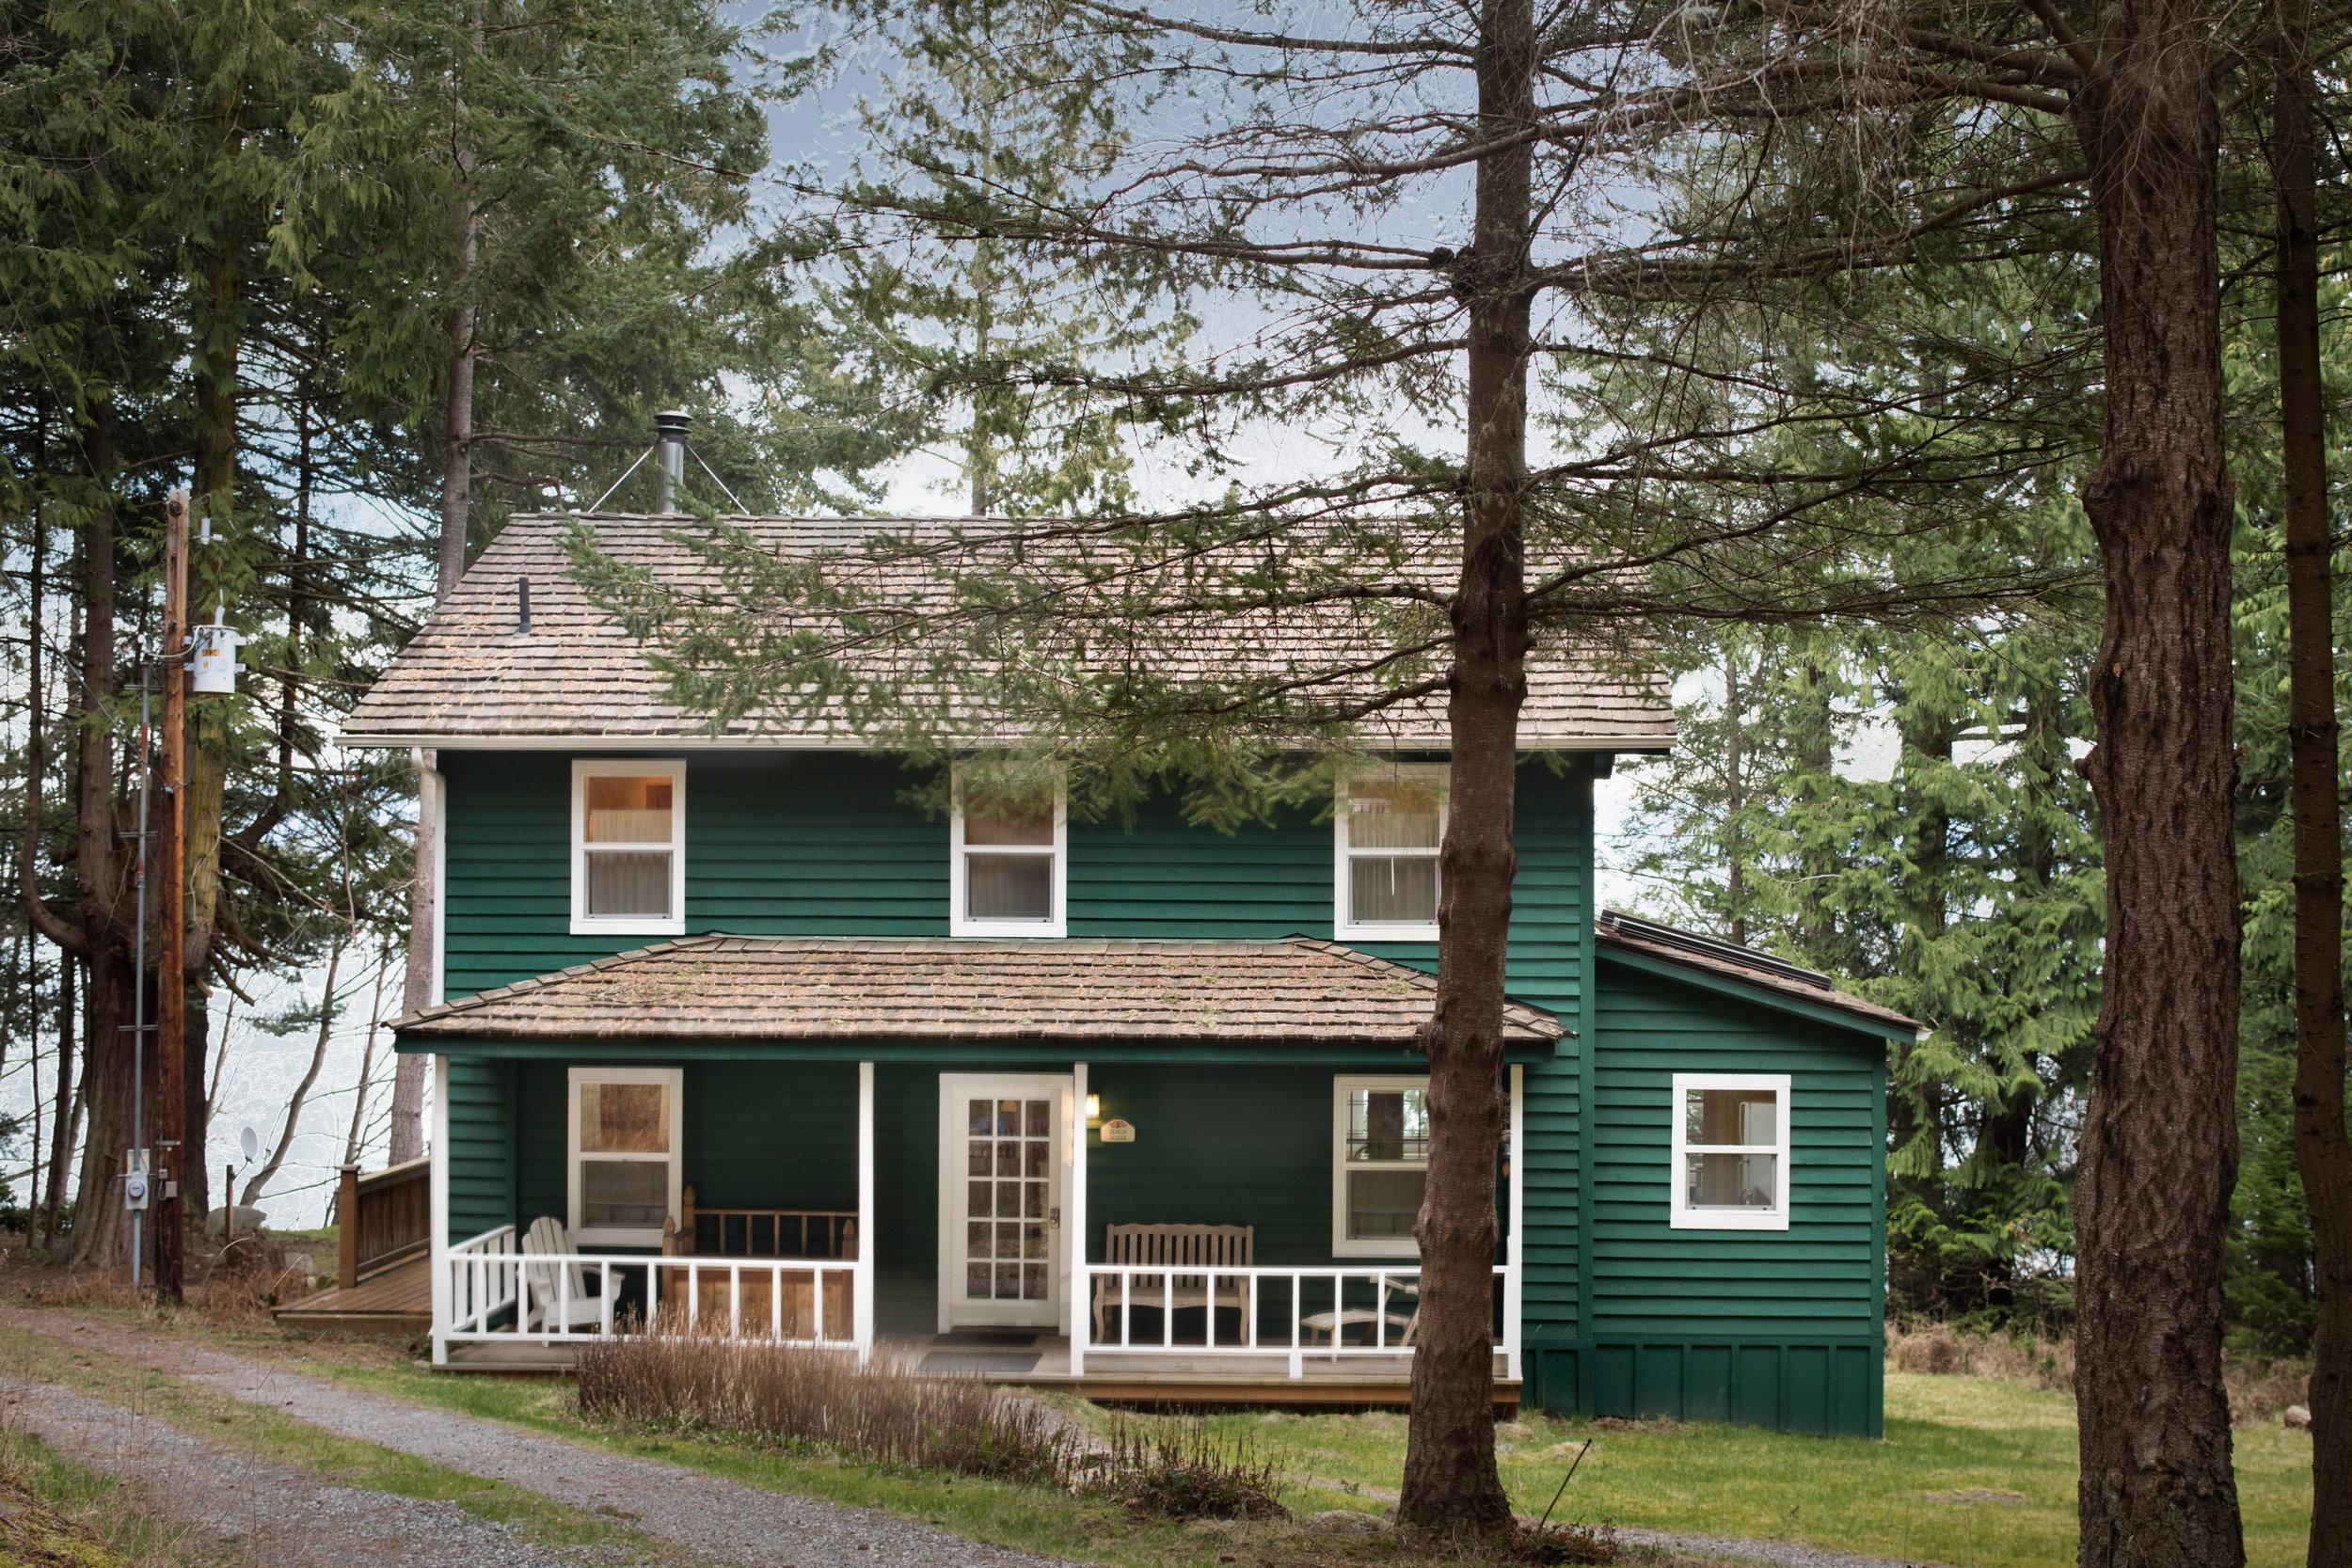 190322-Beach-House-2-0001-3.jpg